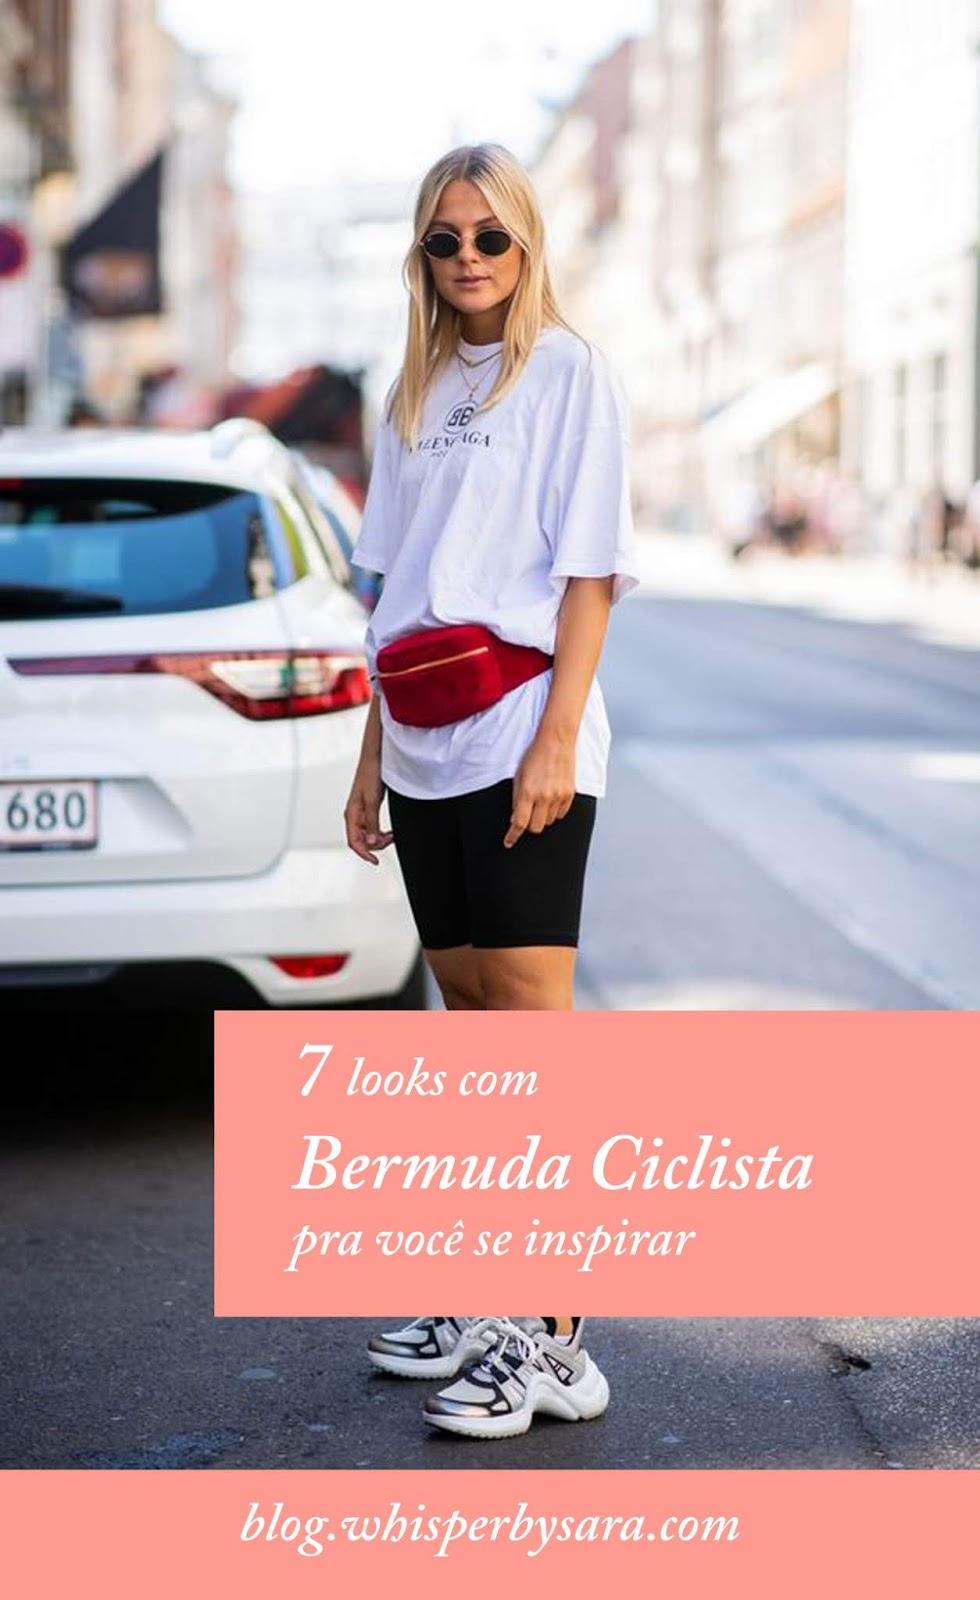 #whisperbysara #streetstyleblog #streetstyle #copenhagenfashionweek #whitetee #balenciaga #redbag #ciclingshorts #bikeshorts #leggingshorts #bermudaciclista #bermudabiker #chunkysneakers #chunky